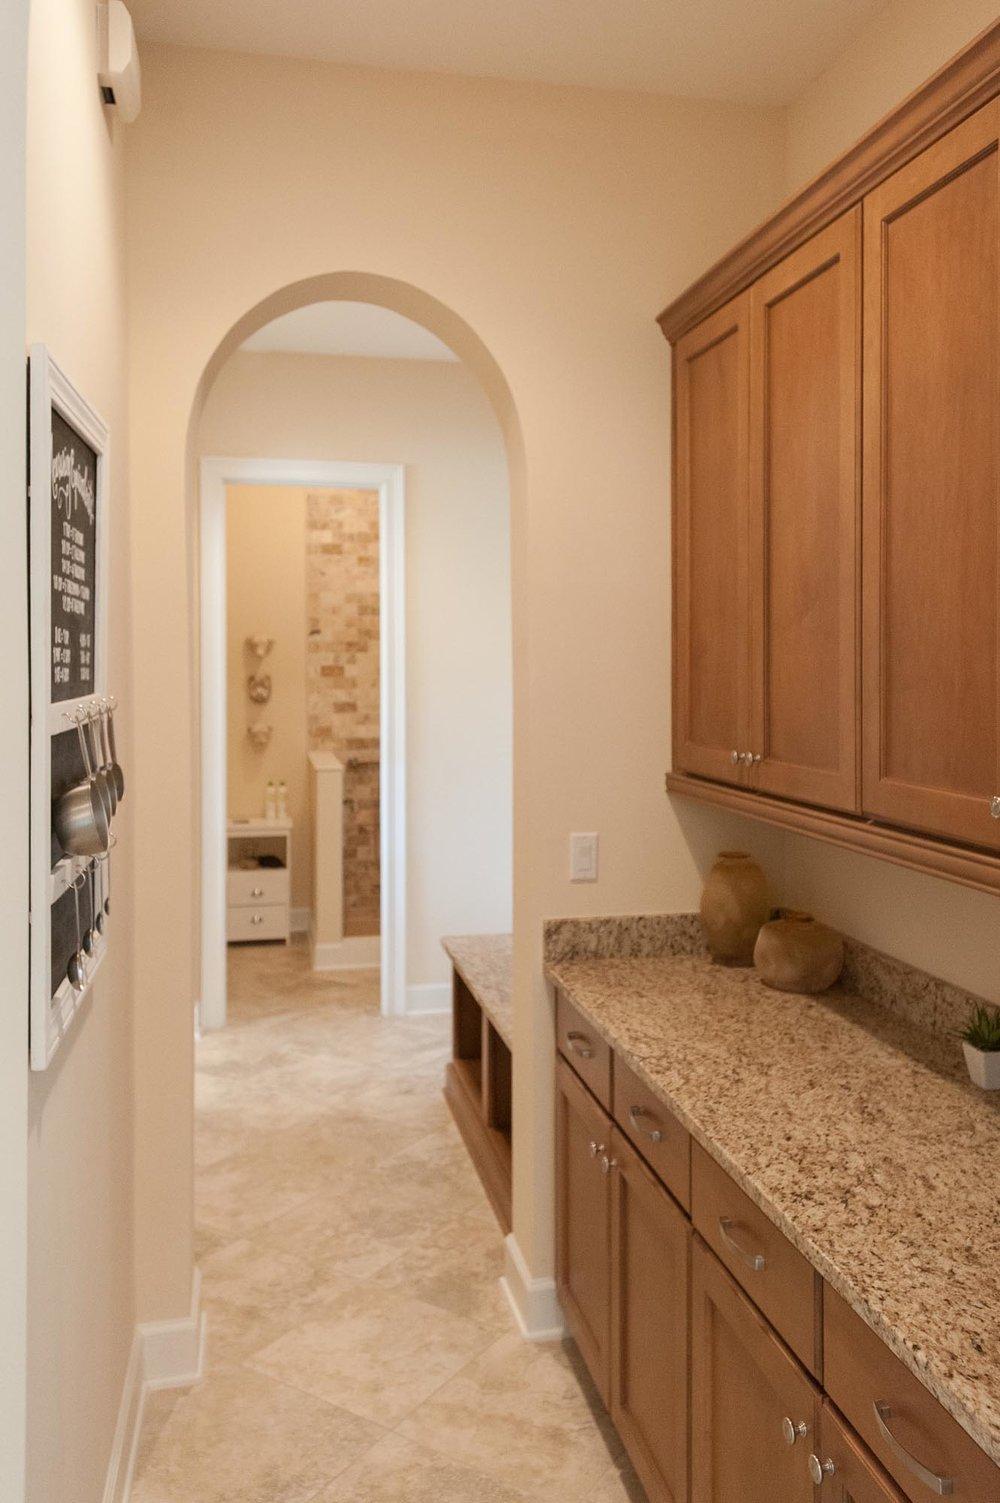 sterling-lennar-celestina-st johns-florida-nefba-northeast florida-southeastern united states-residential interior design-contemporary-transitional-pantry-butlers pantry-hallway.jpg